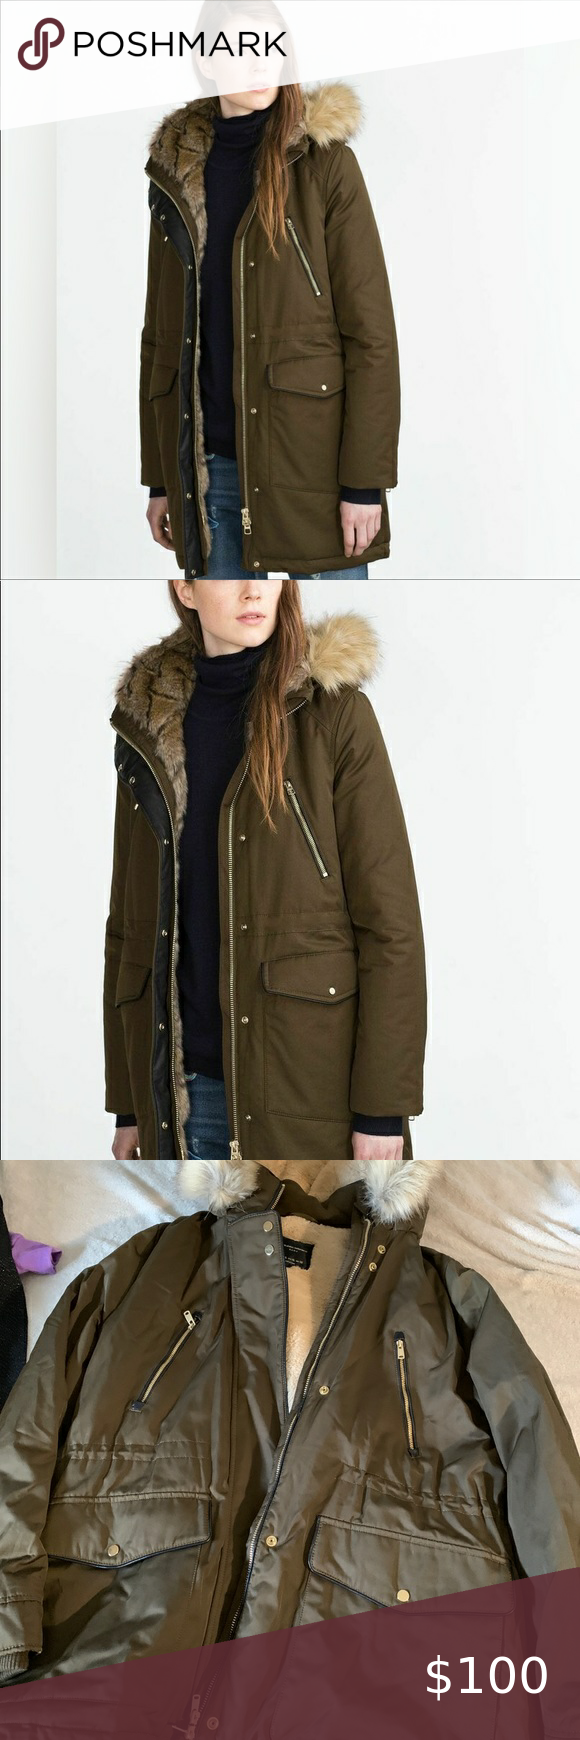 Zara Trafaluc Outerwear Clothes Design Zara Jackets For Women [ 1740 x 580 Pixel ]